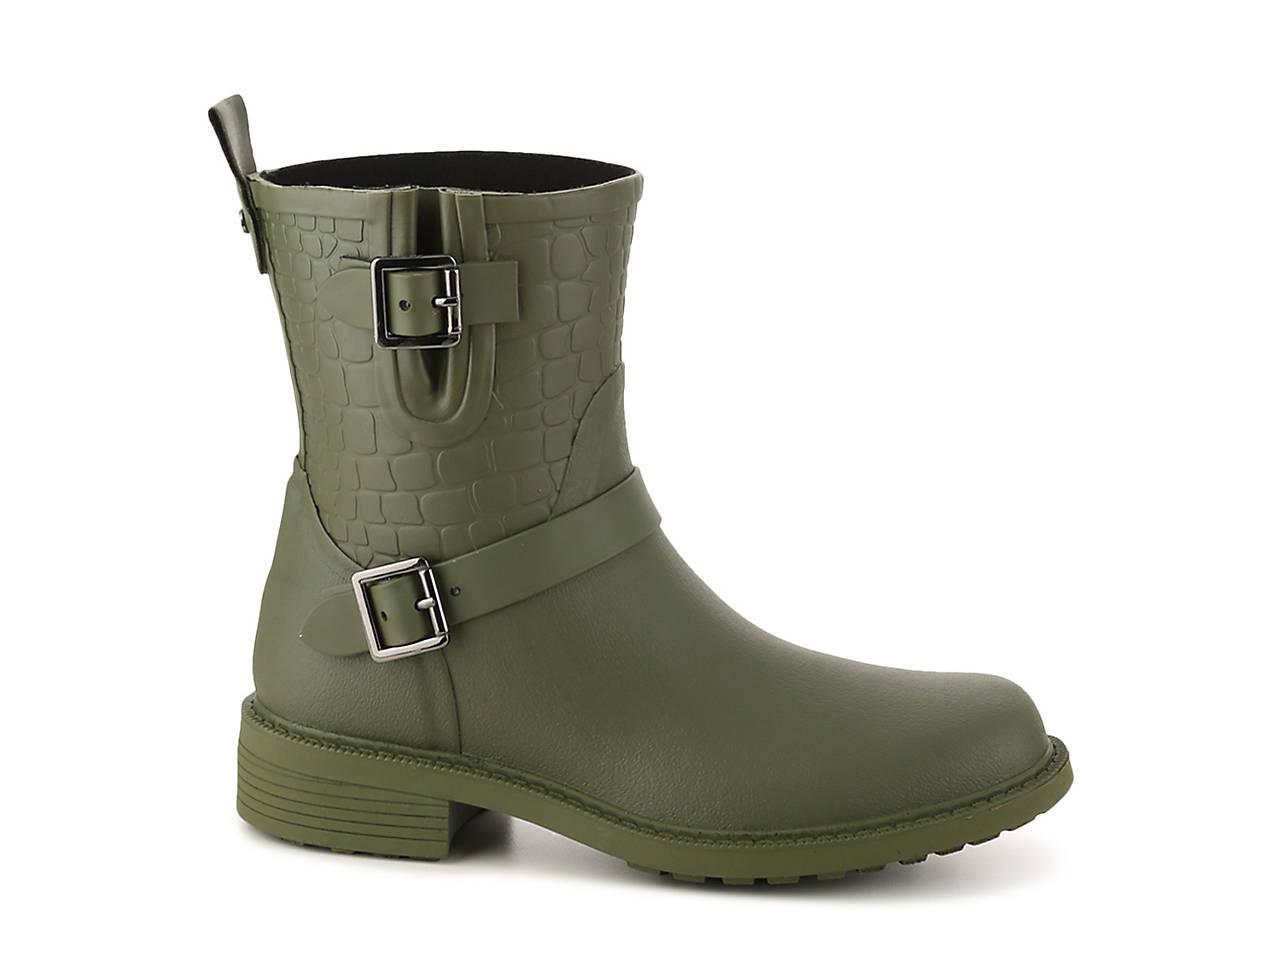 27609cac4feff 7000 Sam Edelman Keigan Waterproof Rain Boots Women39s